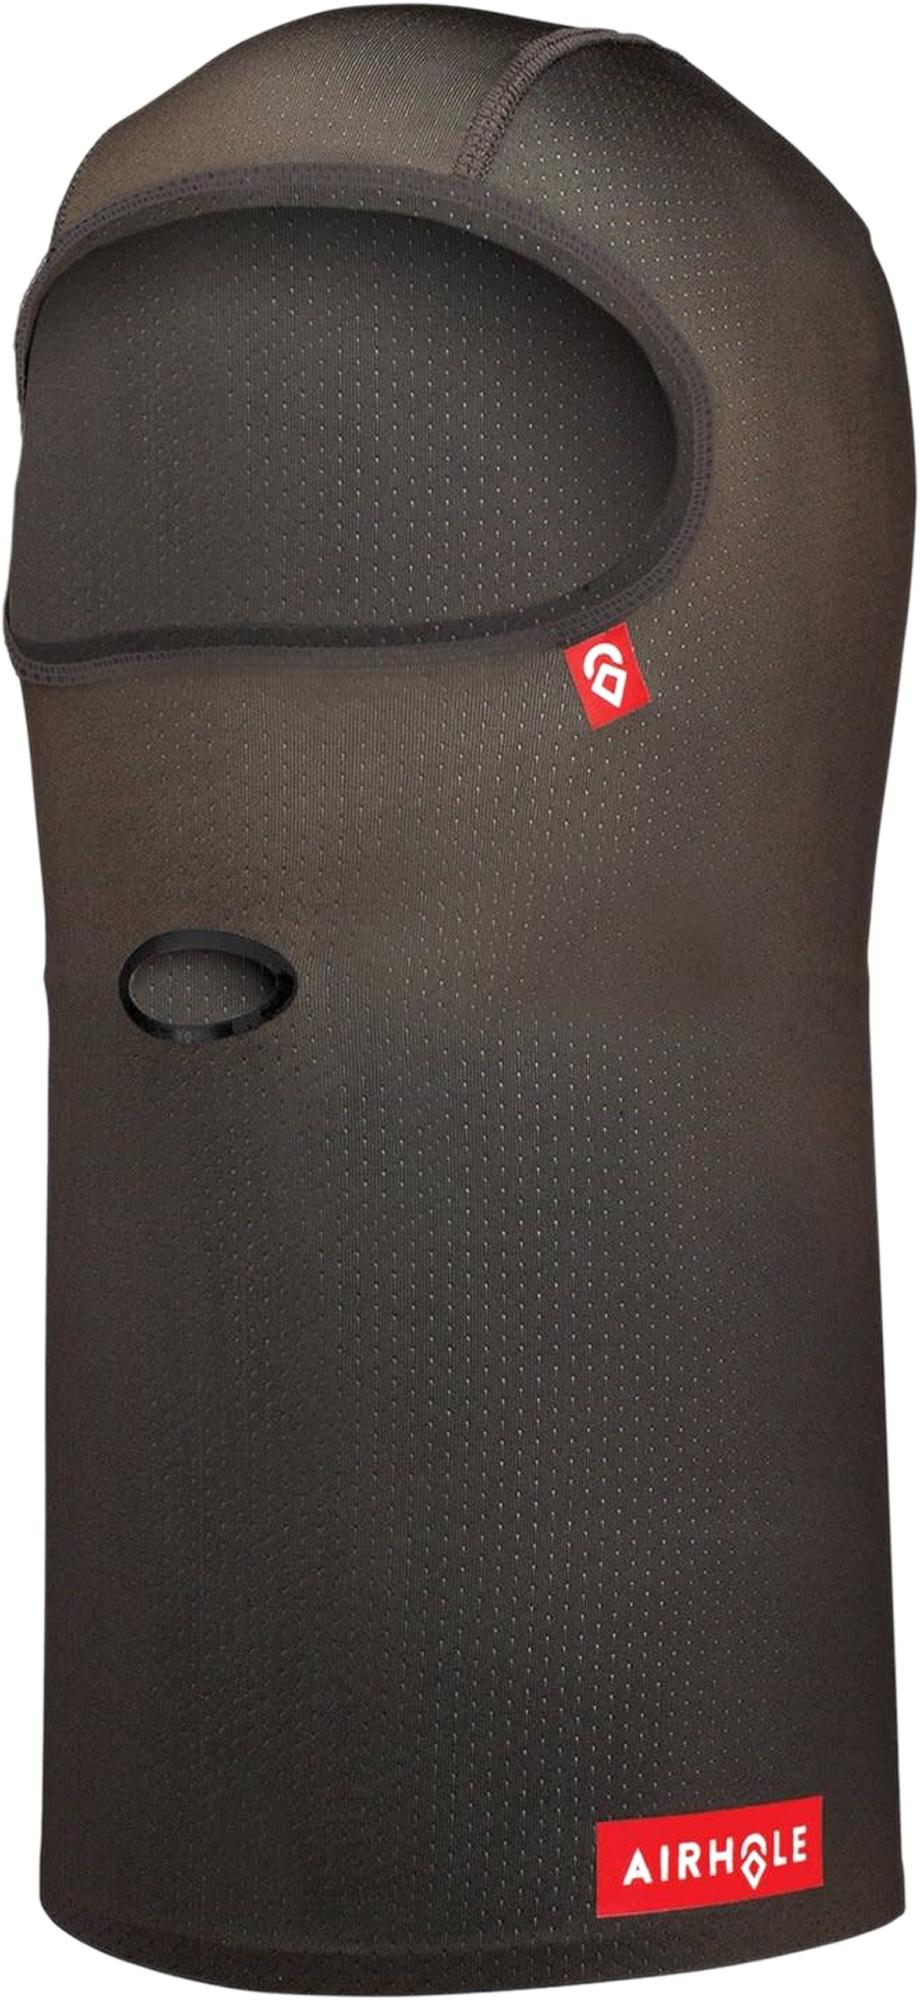 Airhole Балаклава Airhole Classic - Drylite шнурок кожаный на шею 09001з